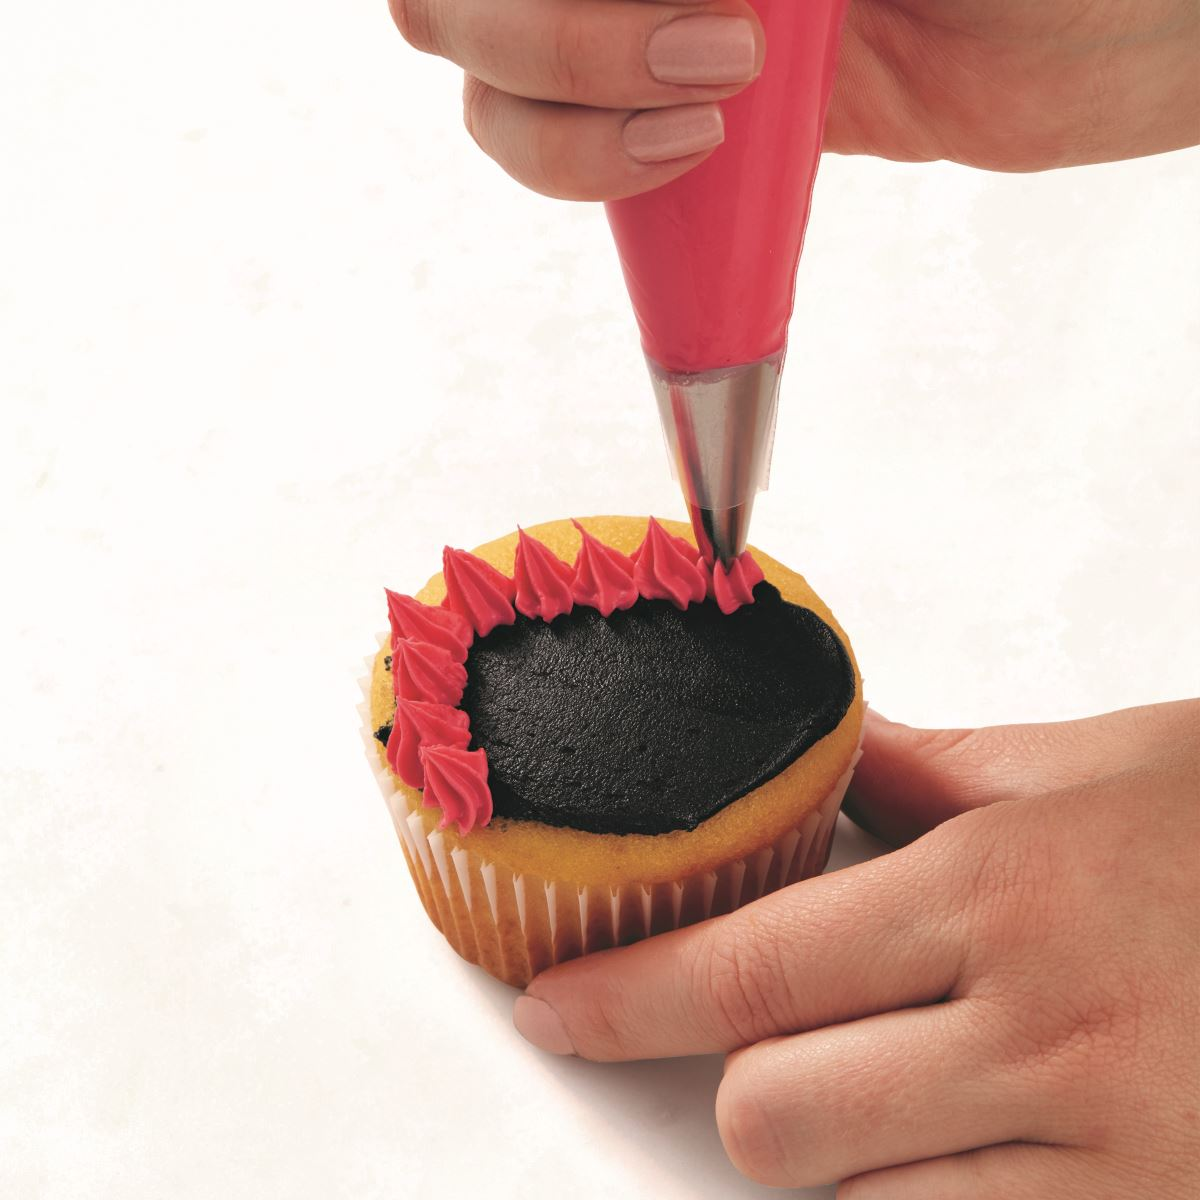 PINK ONE-EYED MONSTER CUPCAKE step 1